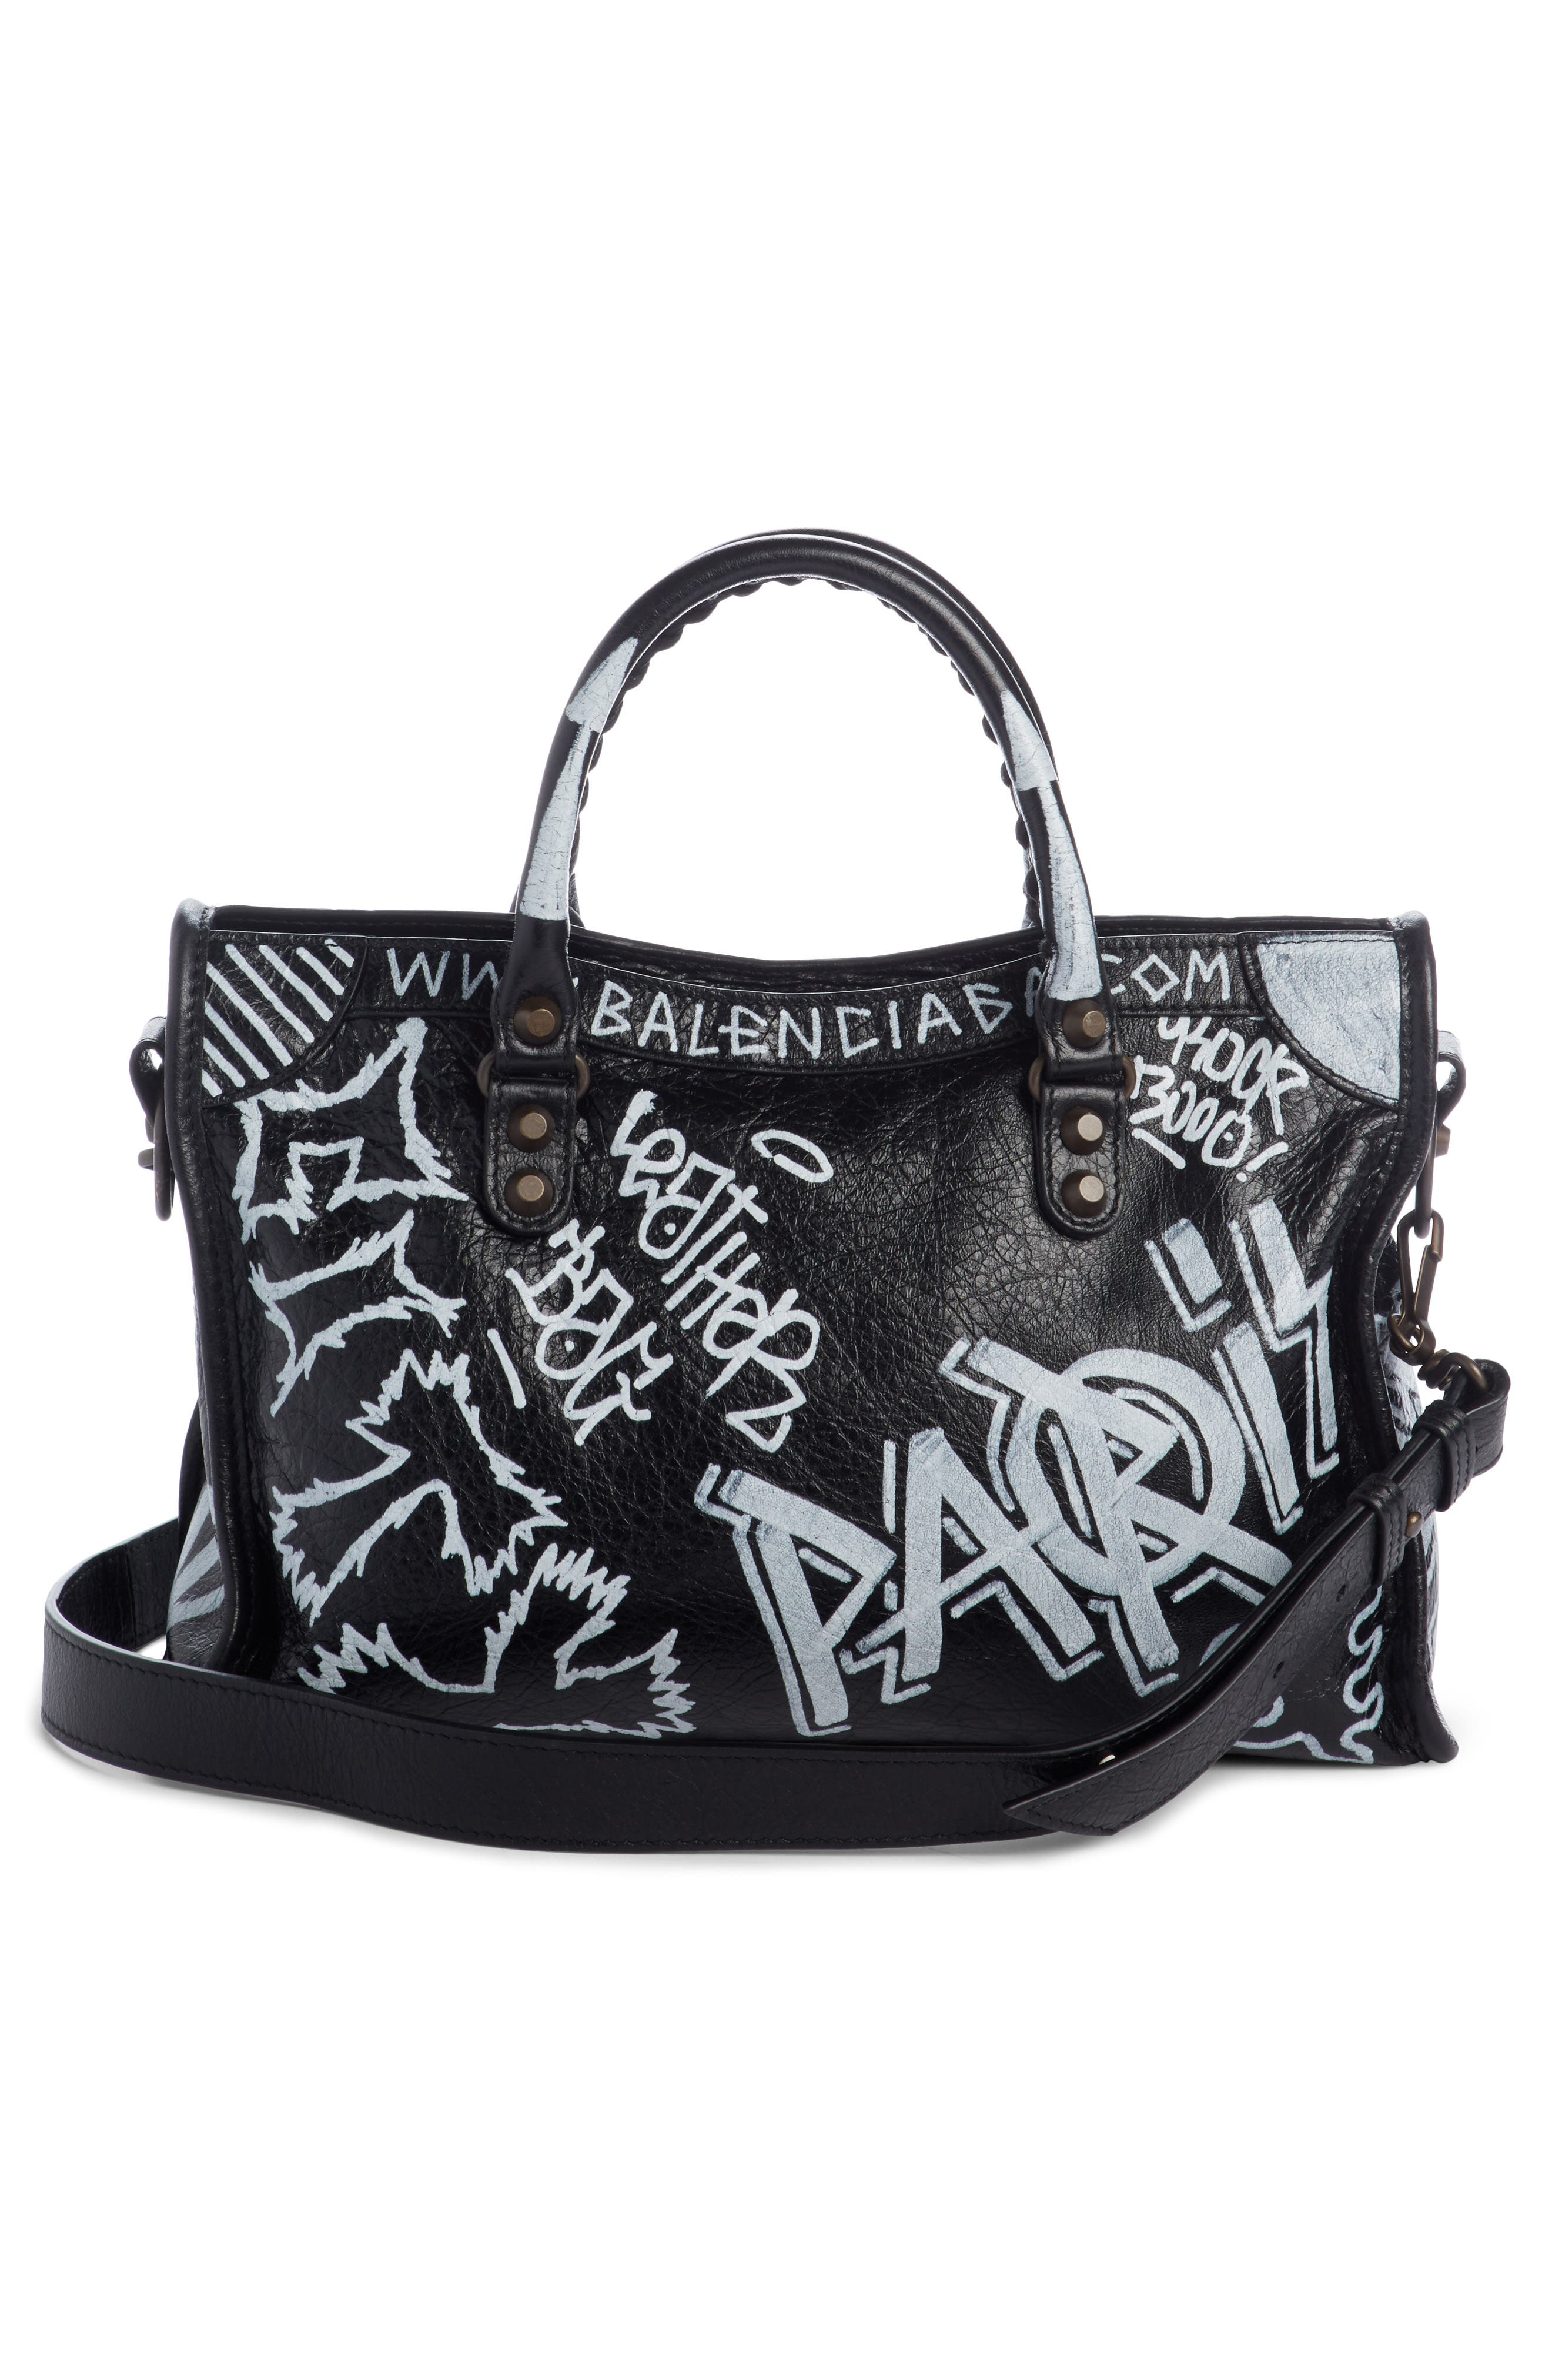 Balenciaga Handbags   Wallets for Women   Nordstrom 07ea5736f0